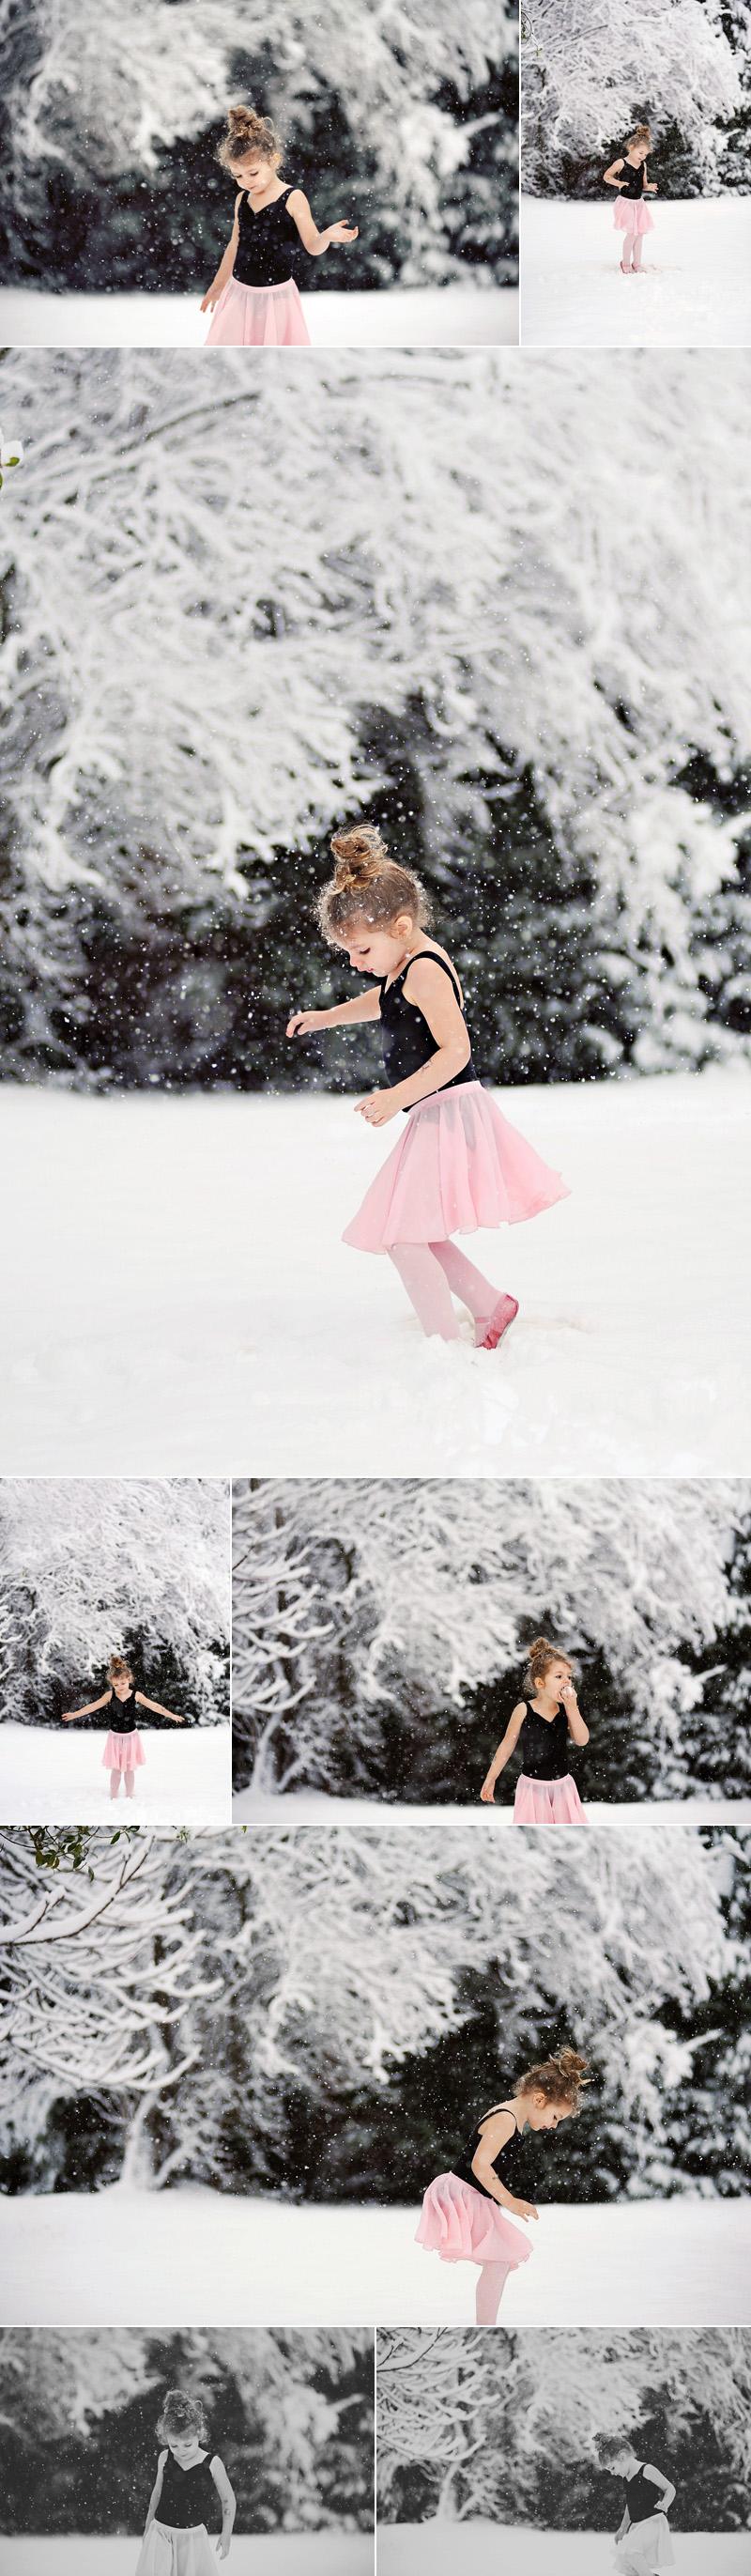 snow ballet